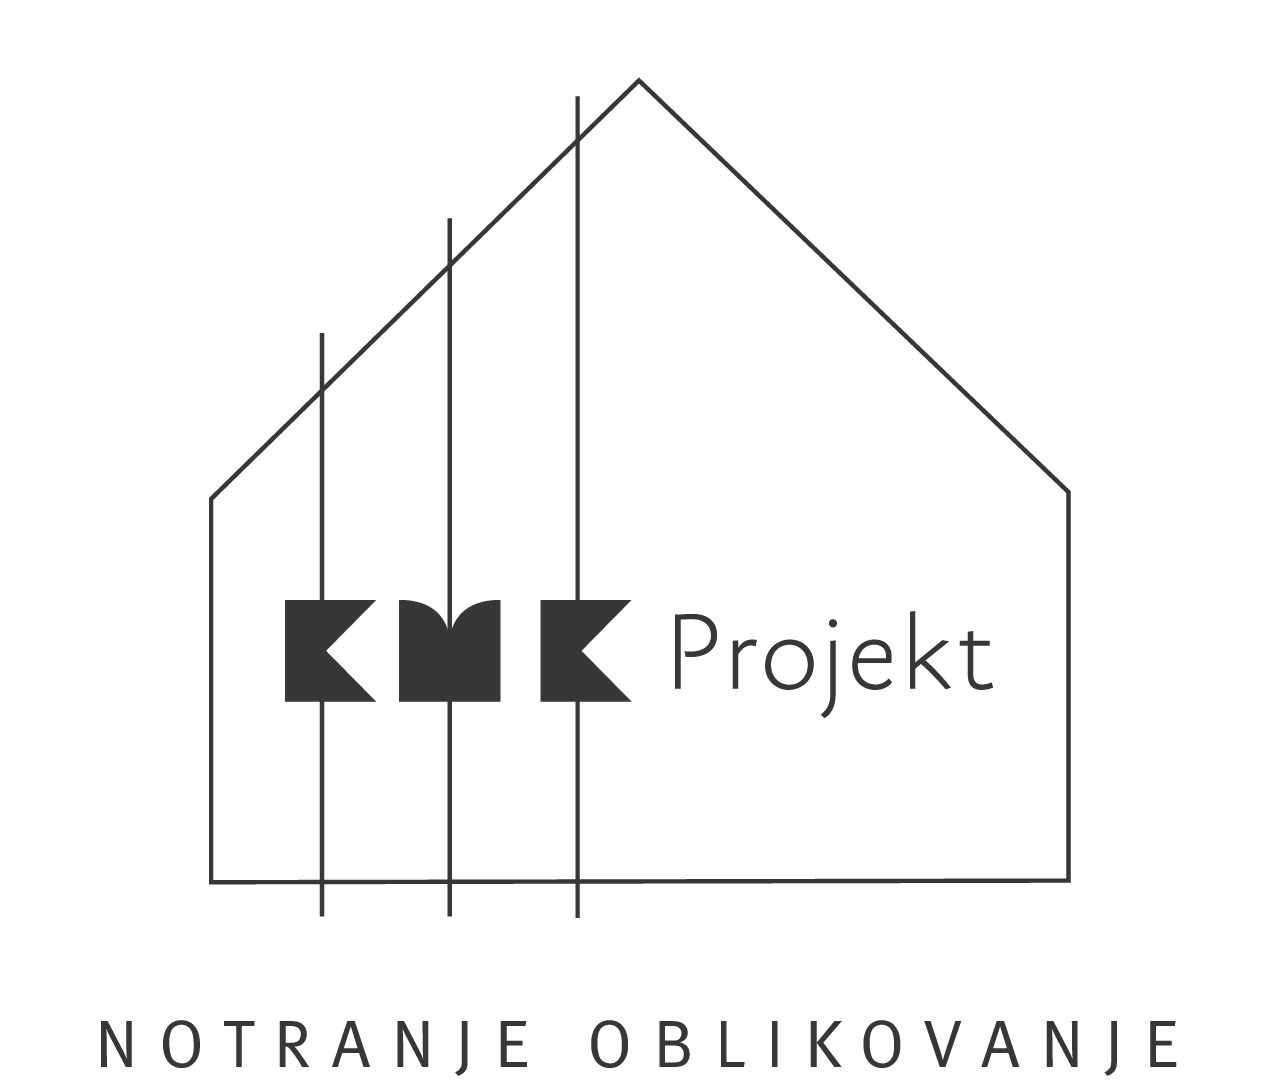 KMK Projekt